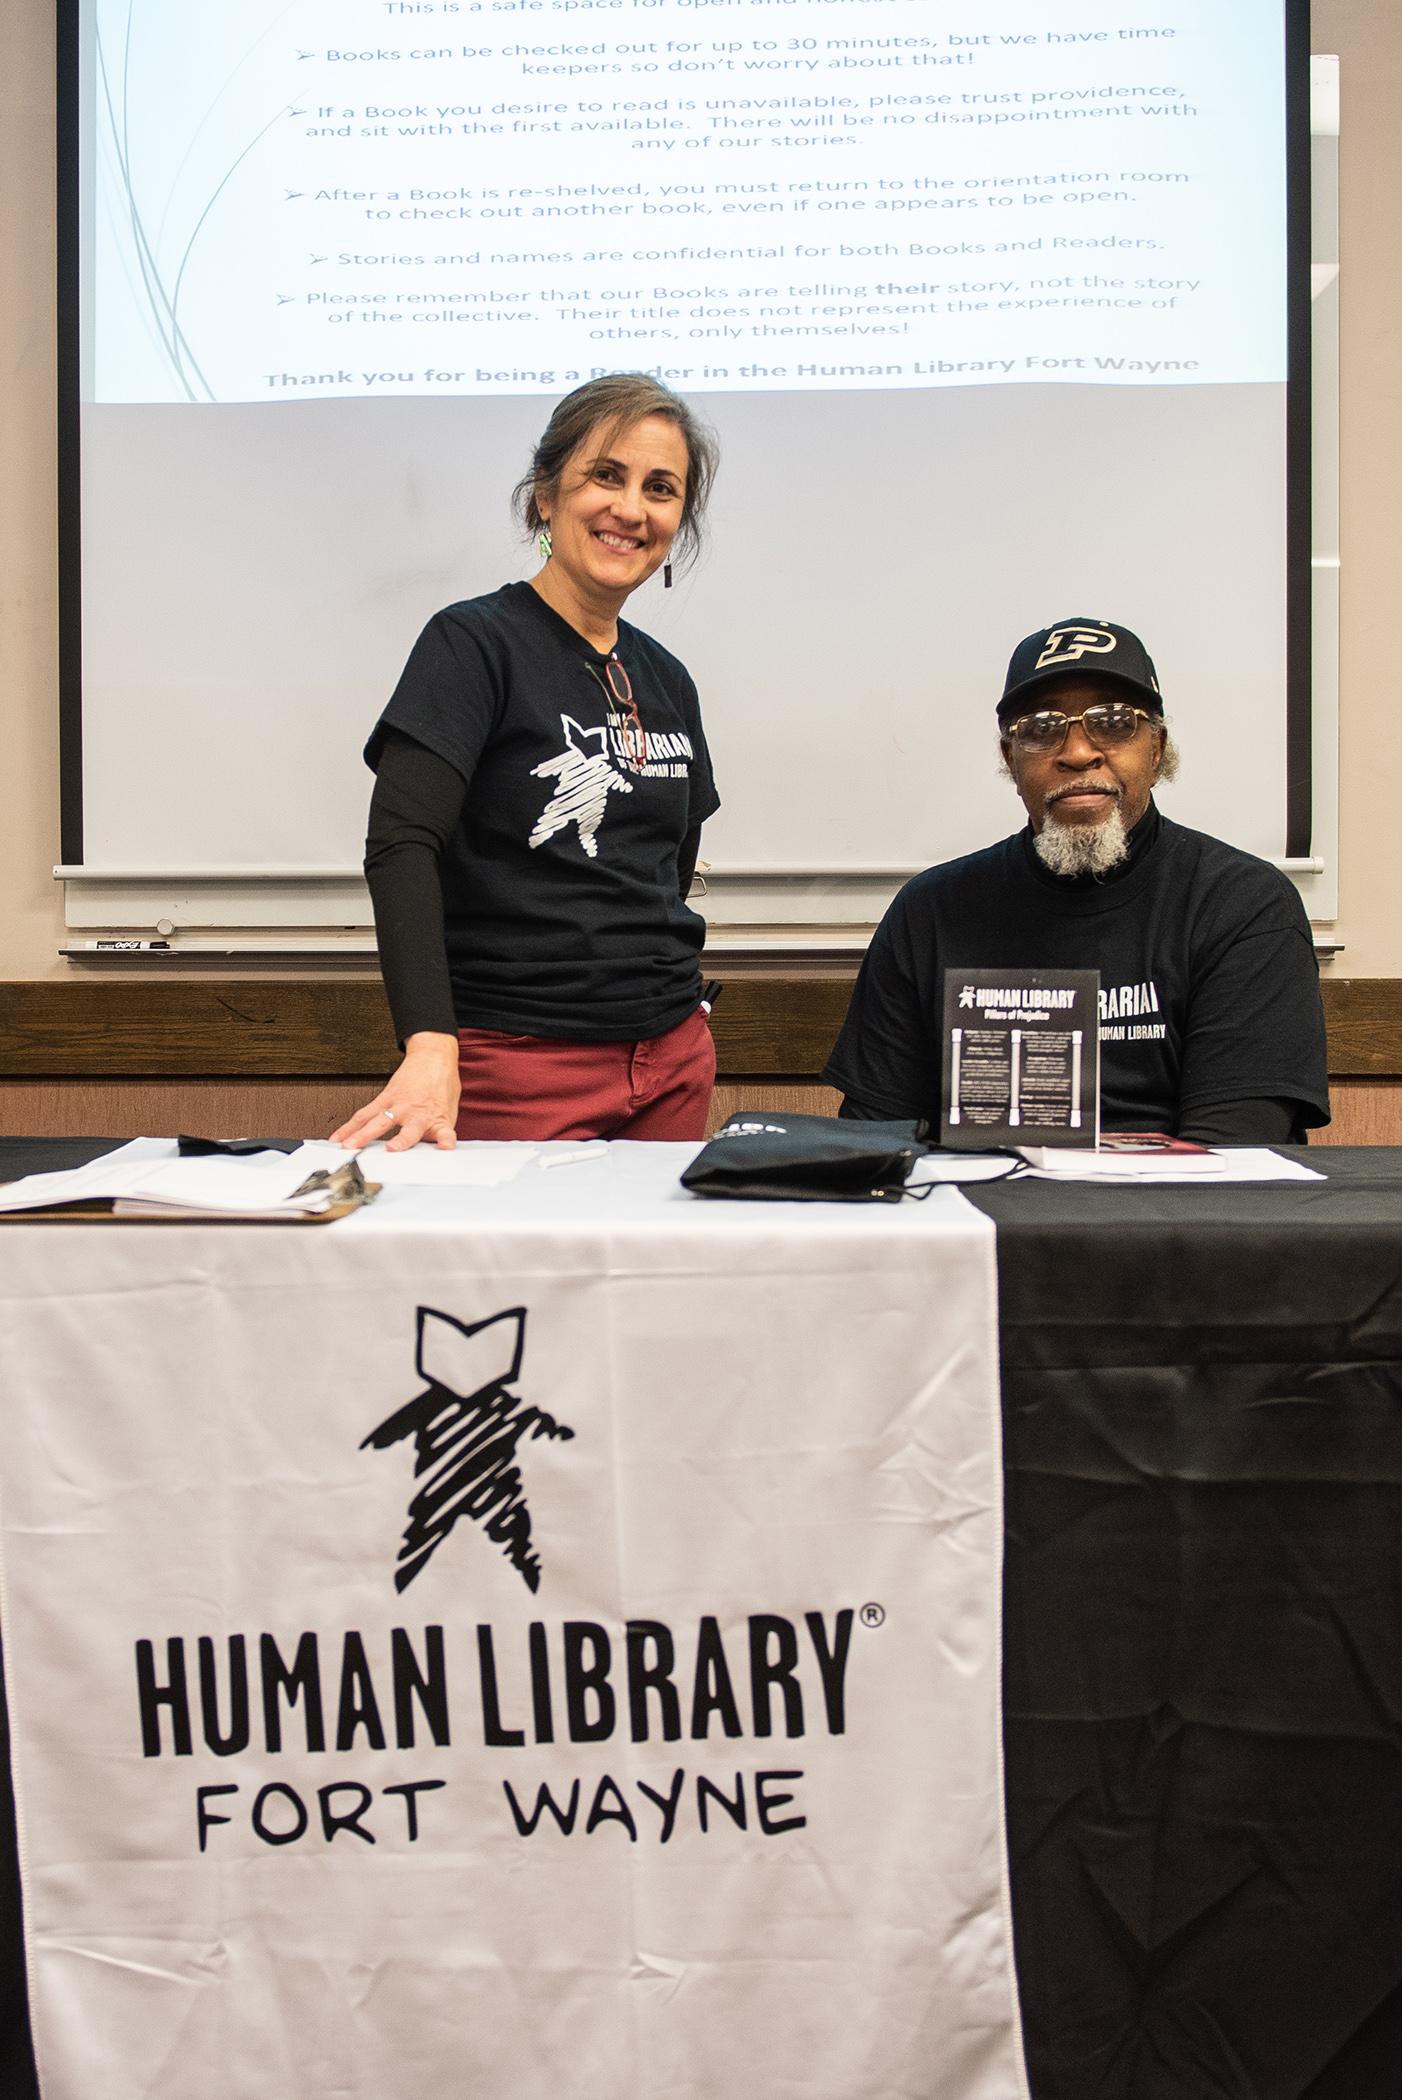 20190220-PFW-Human-Library-JW-001.jpg